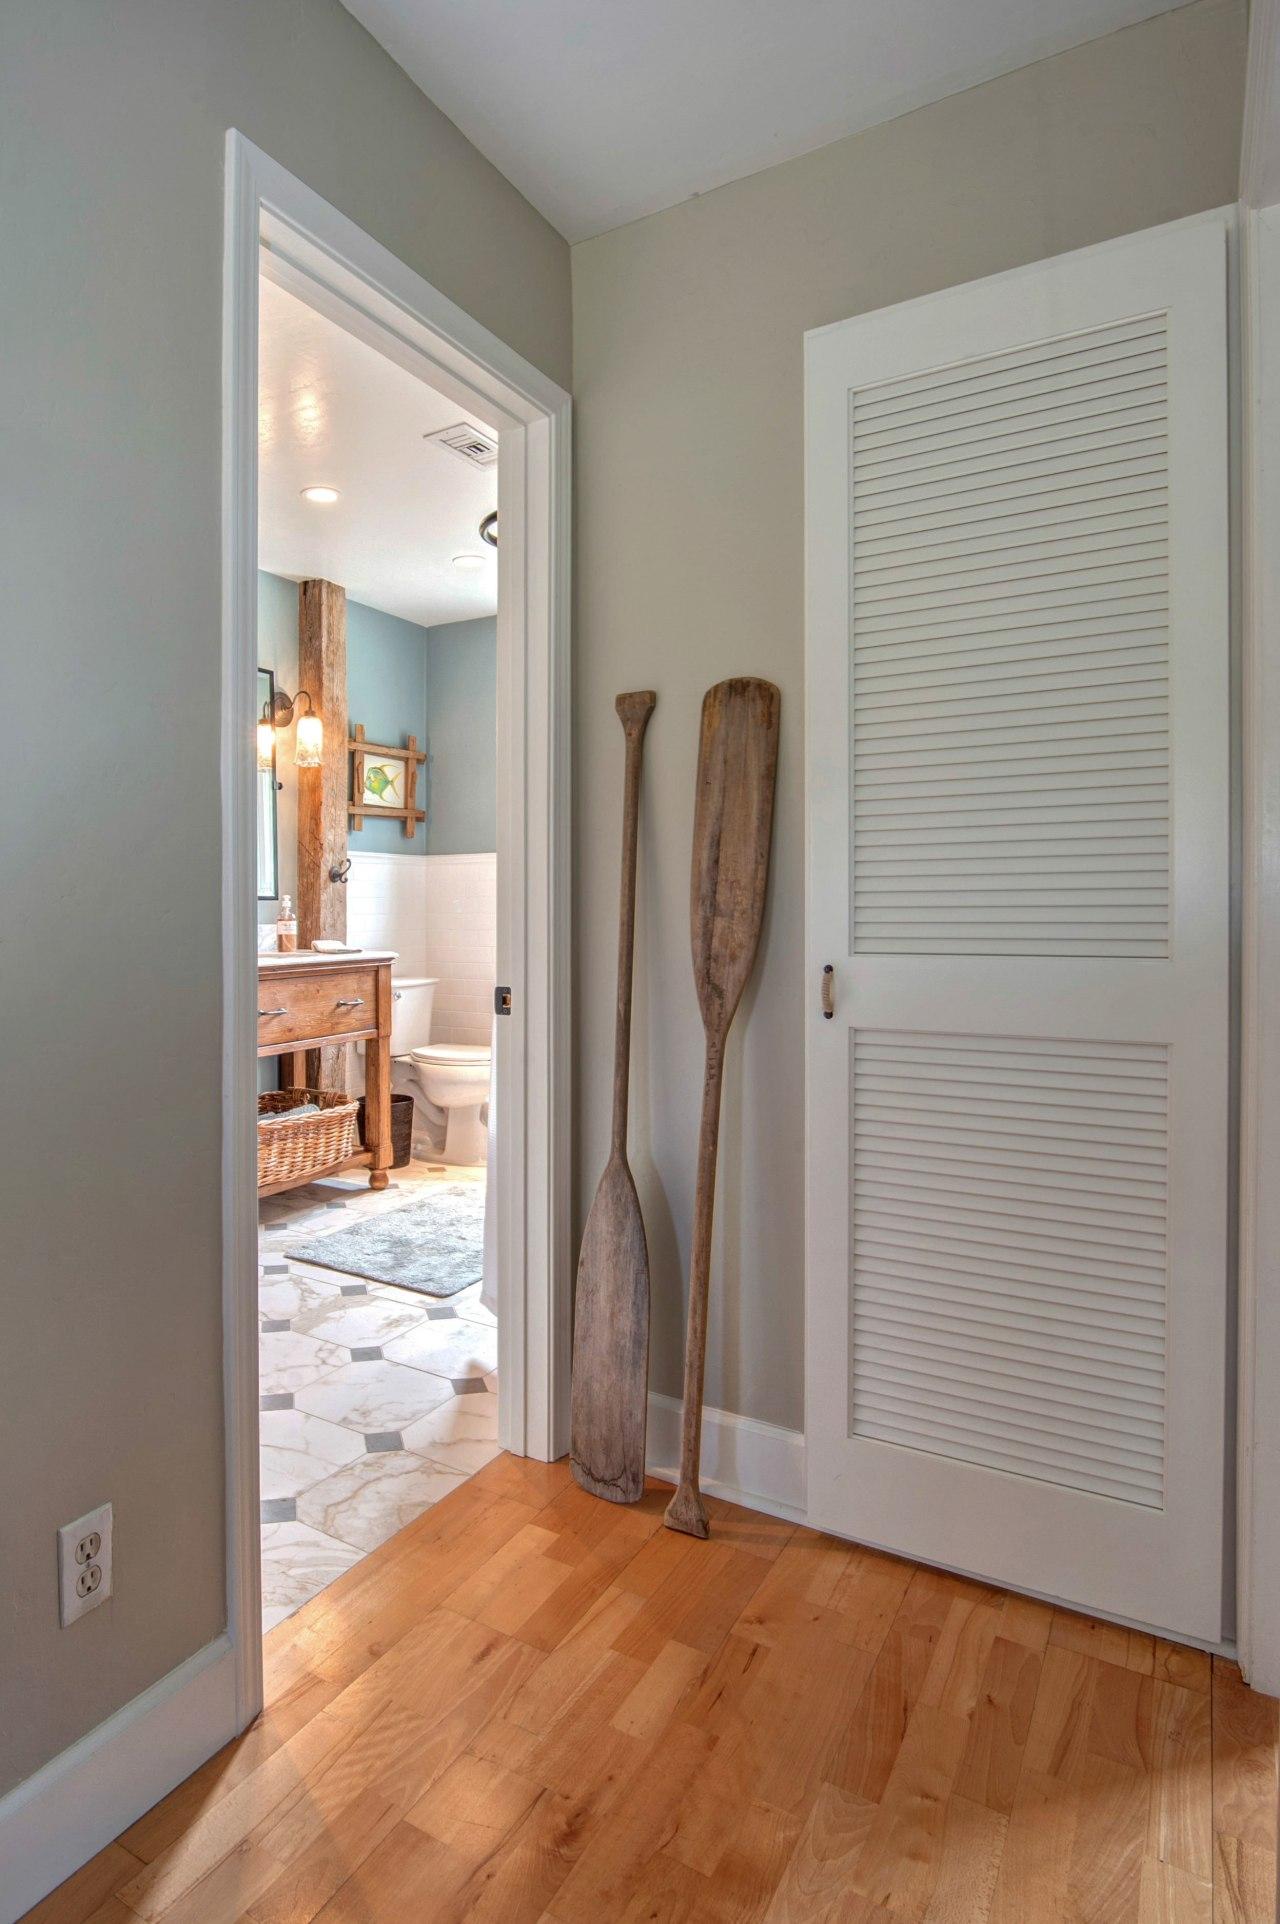 This modest guest bathroom celebrates a relaxed seaside ceiling, door, floor, flooring, hardwood, home, interior design, laminate flooring, molding, real estate, room, wall, window, window covering, wood, wood flooring, gray